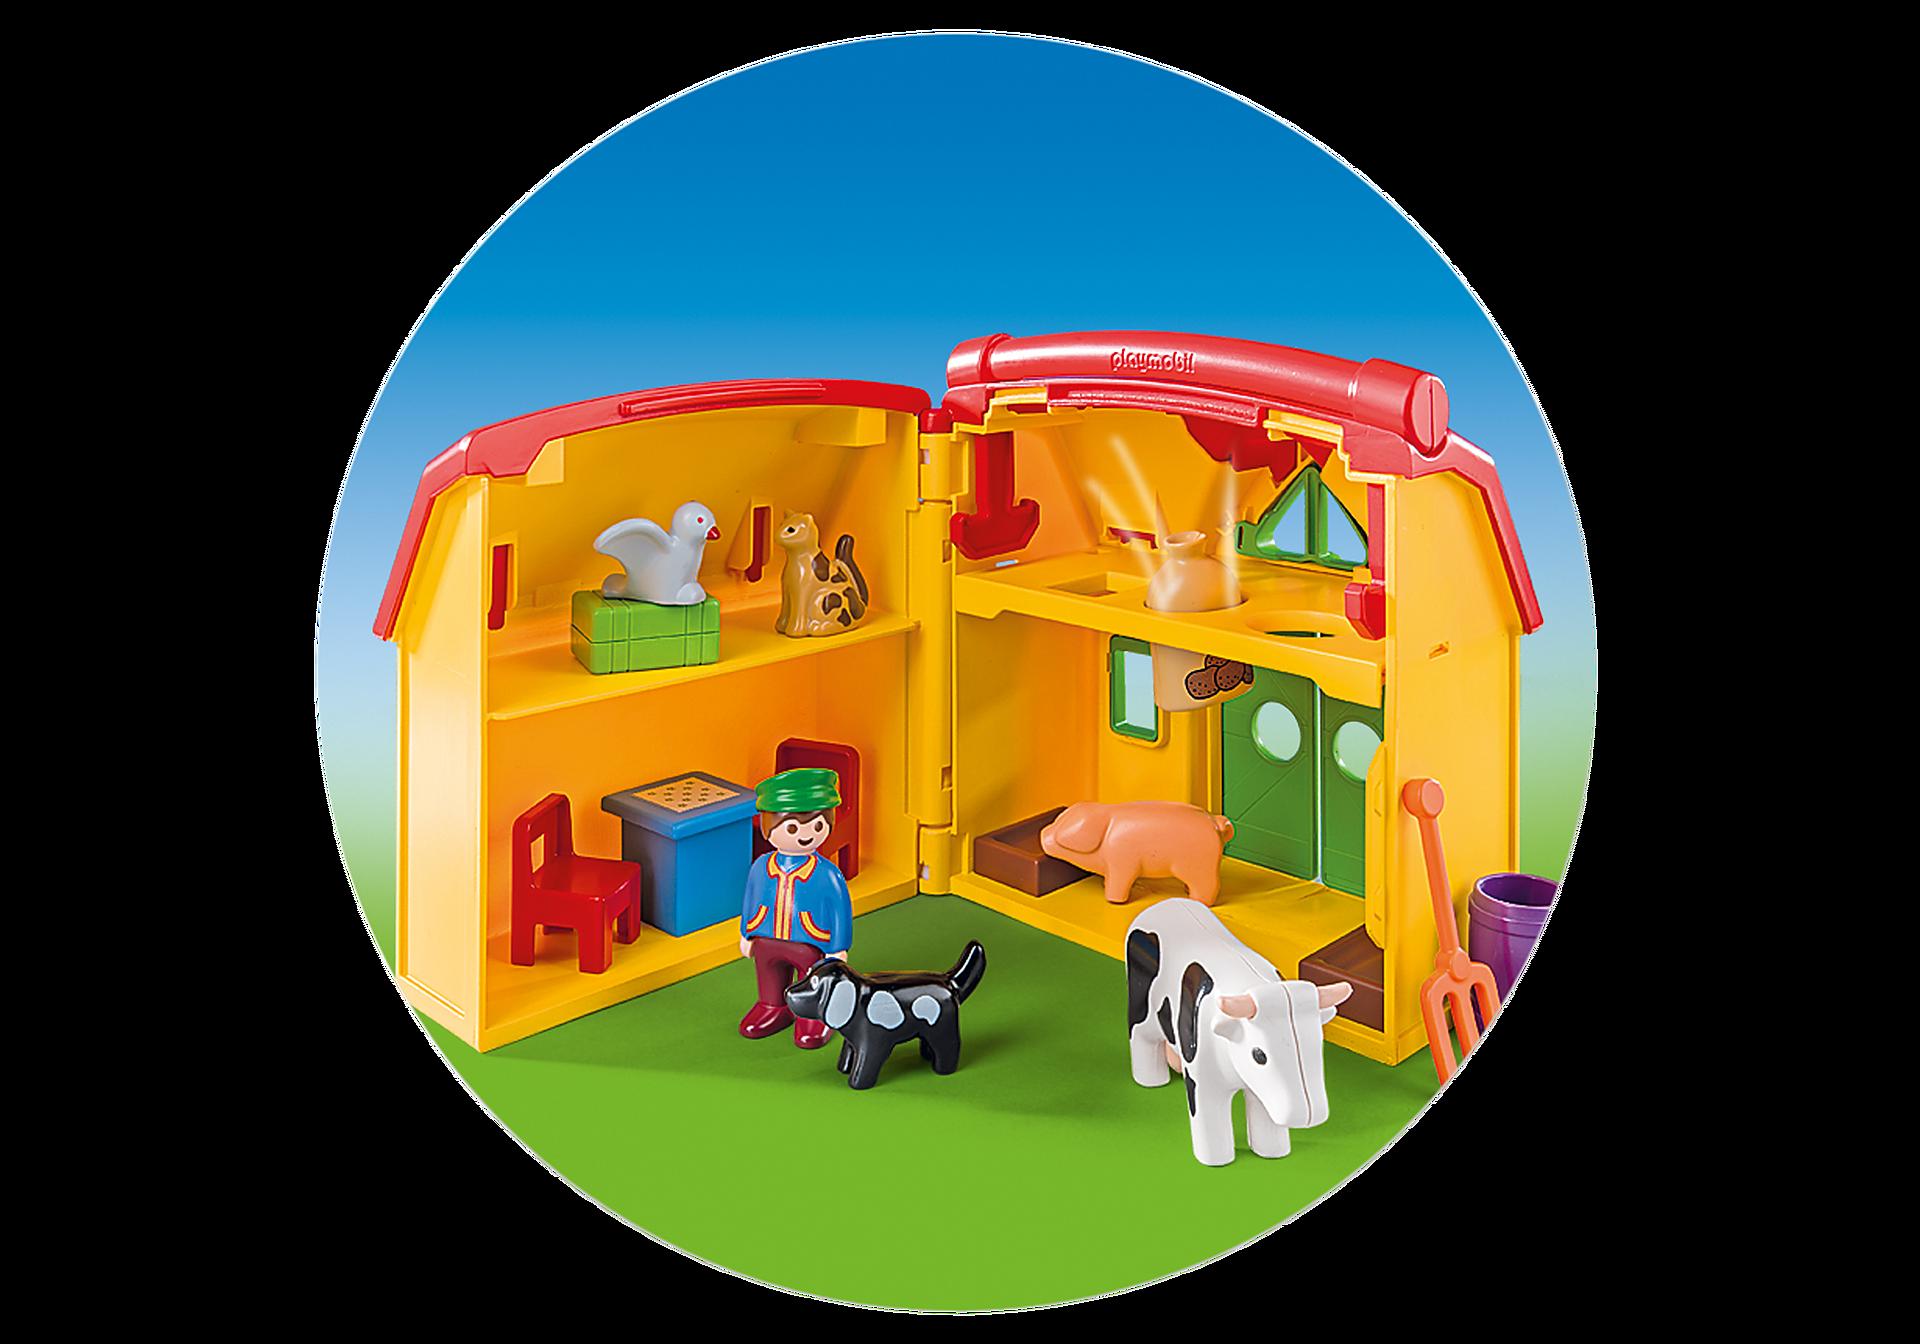 http://media.playmobil.com/i/playmobil/6962_product_extra3/Mein Mitnehm-Bauernhof